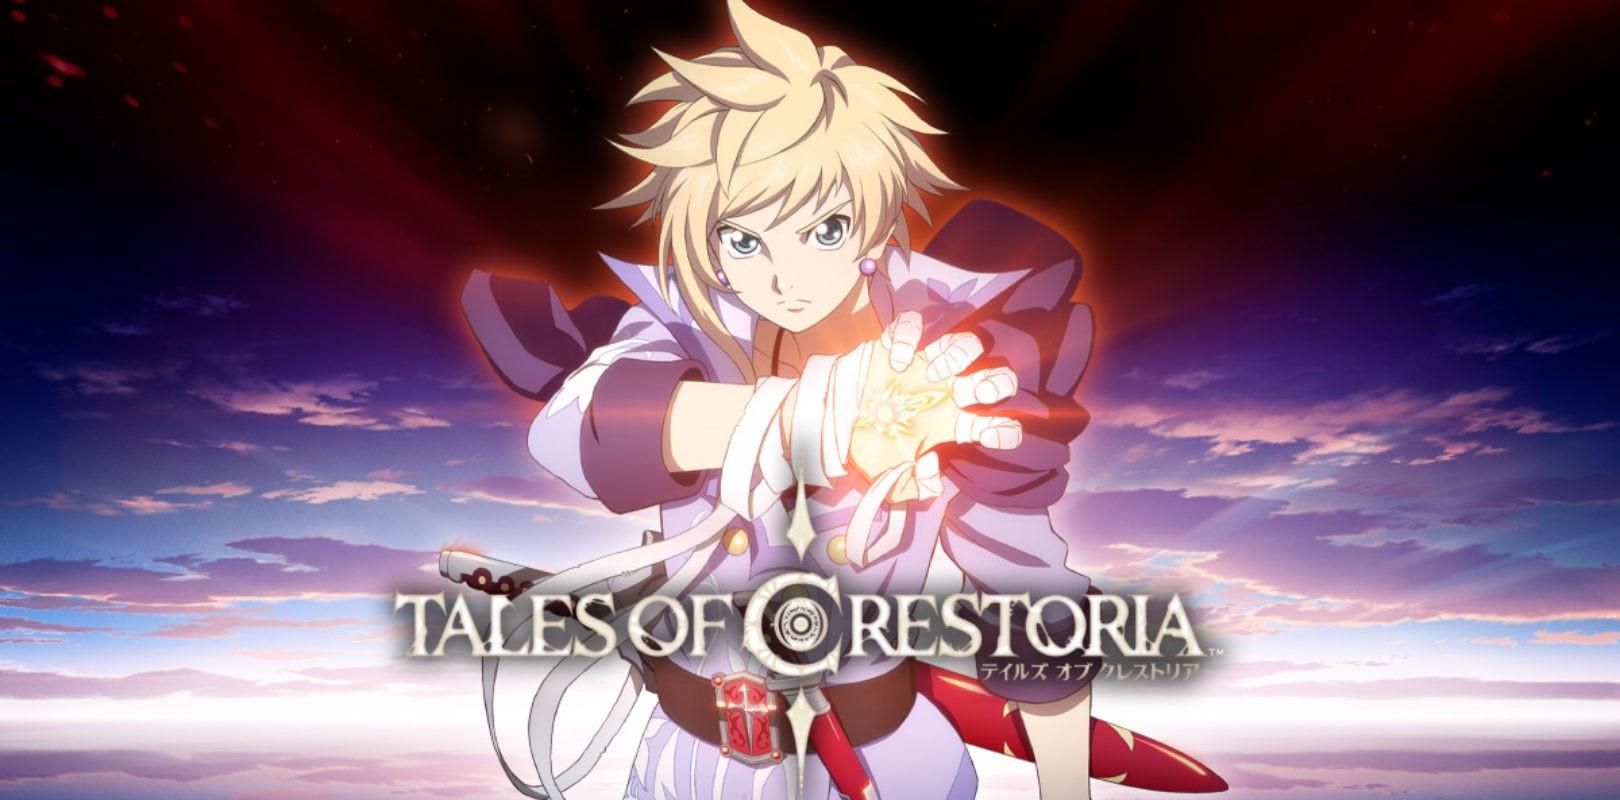 Tales of Crestoria